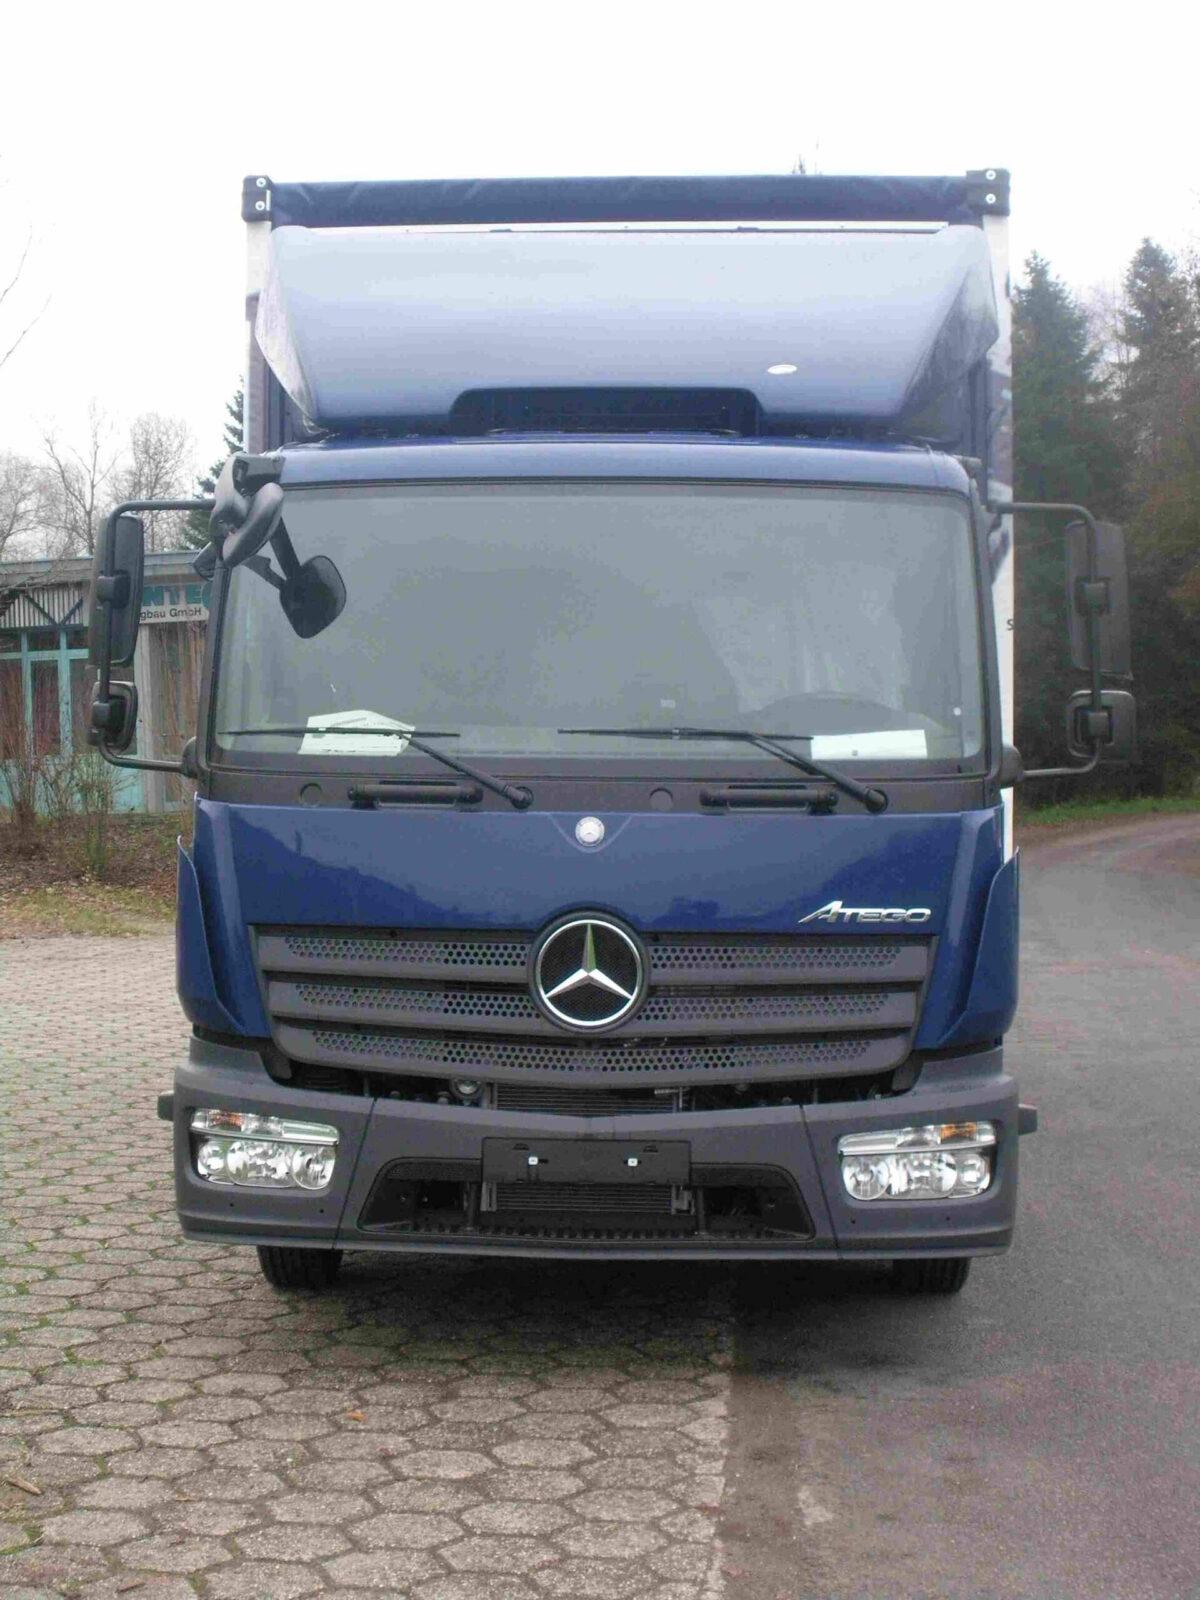 LOOK-ALIKE 3D-Dachspoiler B 2410 x H 600-900 mm für Mercedes Atego S-FHS für abc aeroline